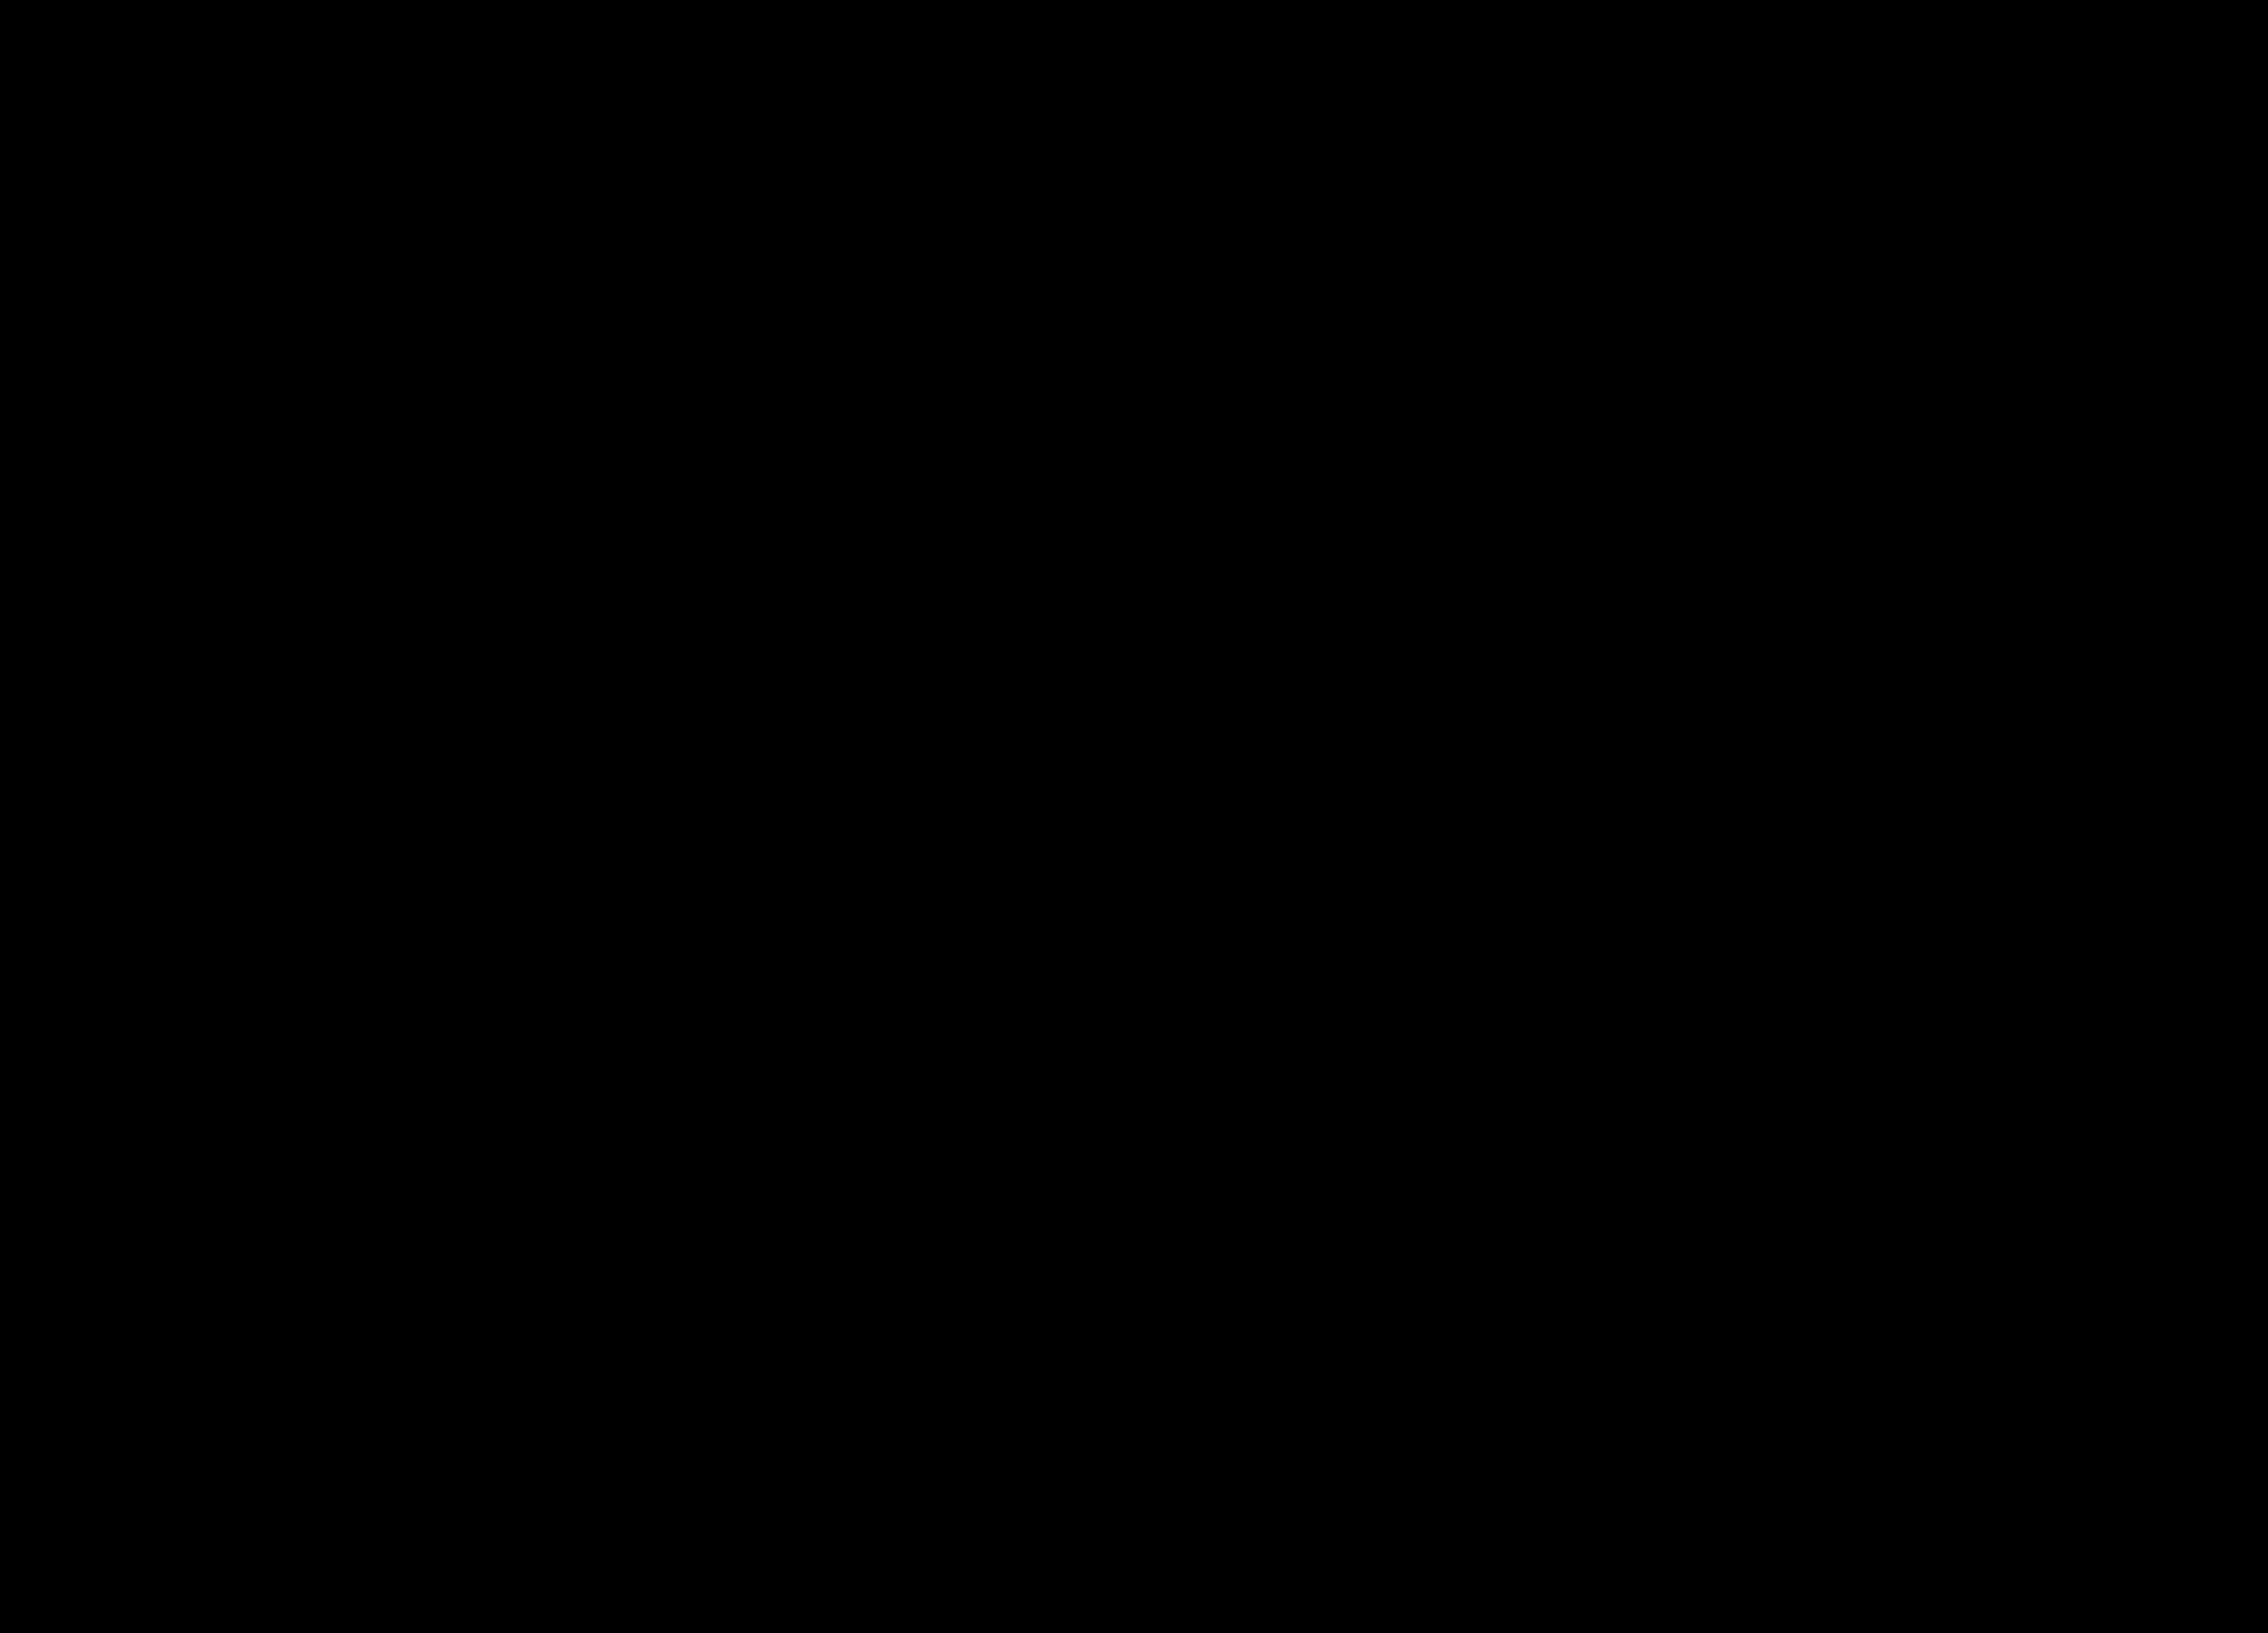 2400x1728 Clipart